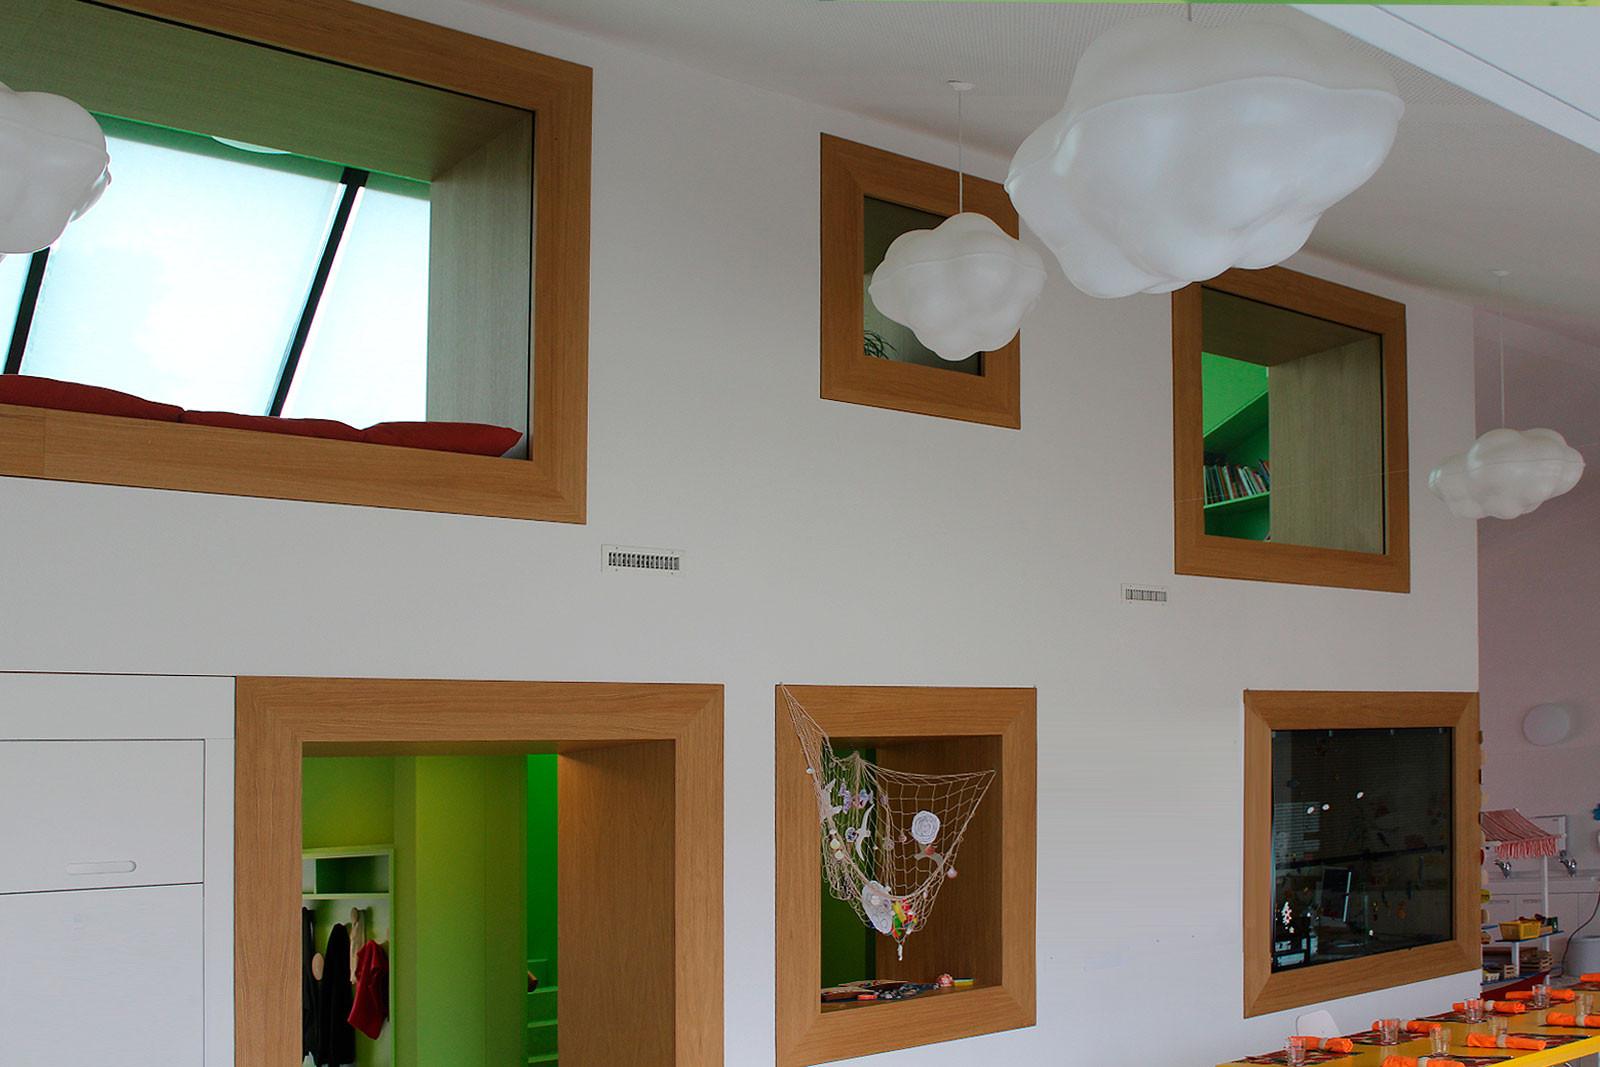 Horbern dayschool, Muri, rollimarchini Architekten, Bern